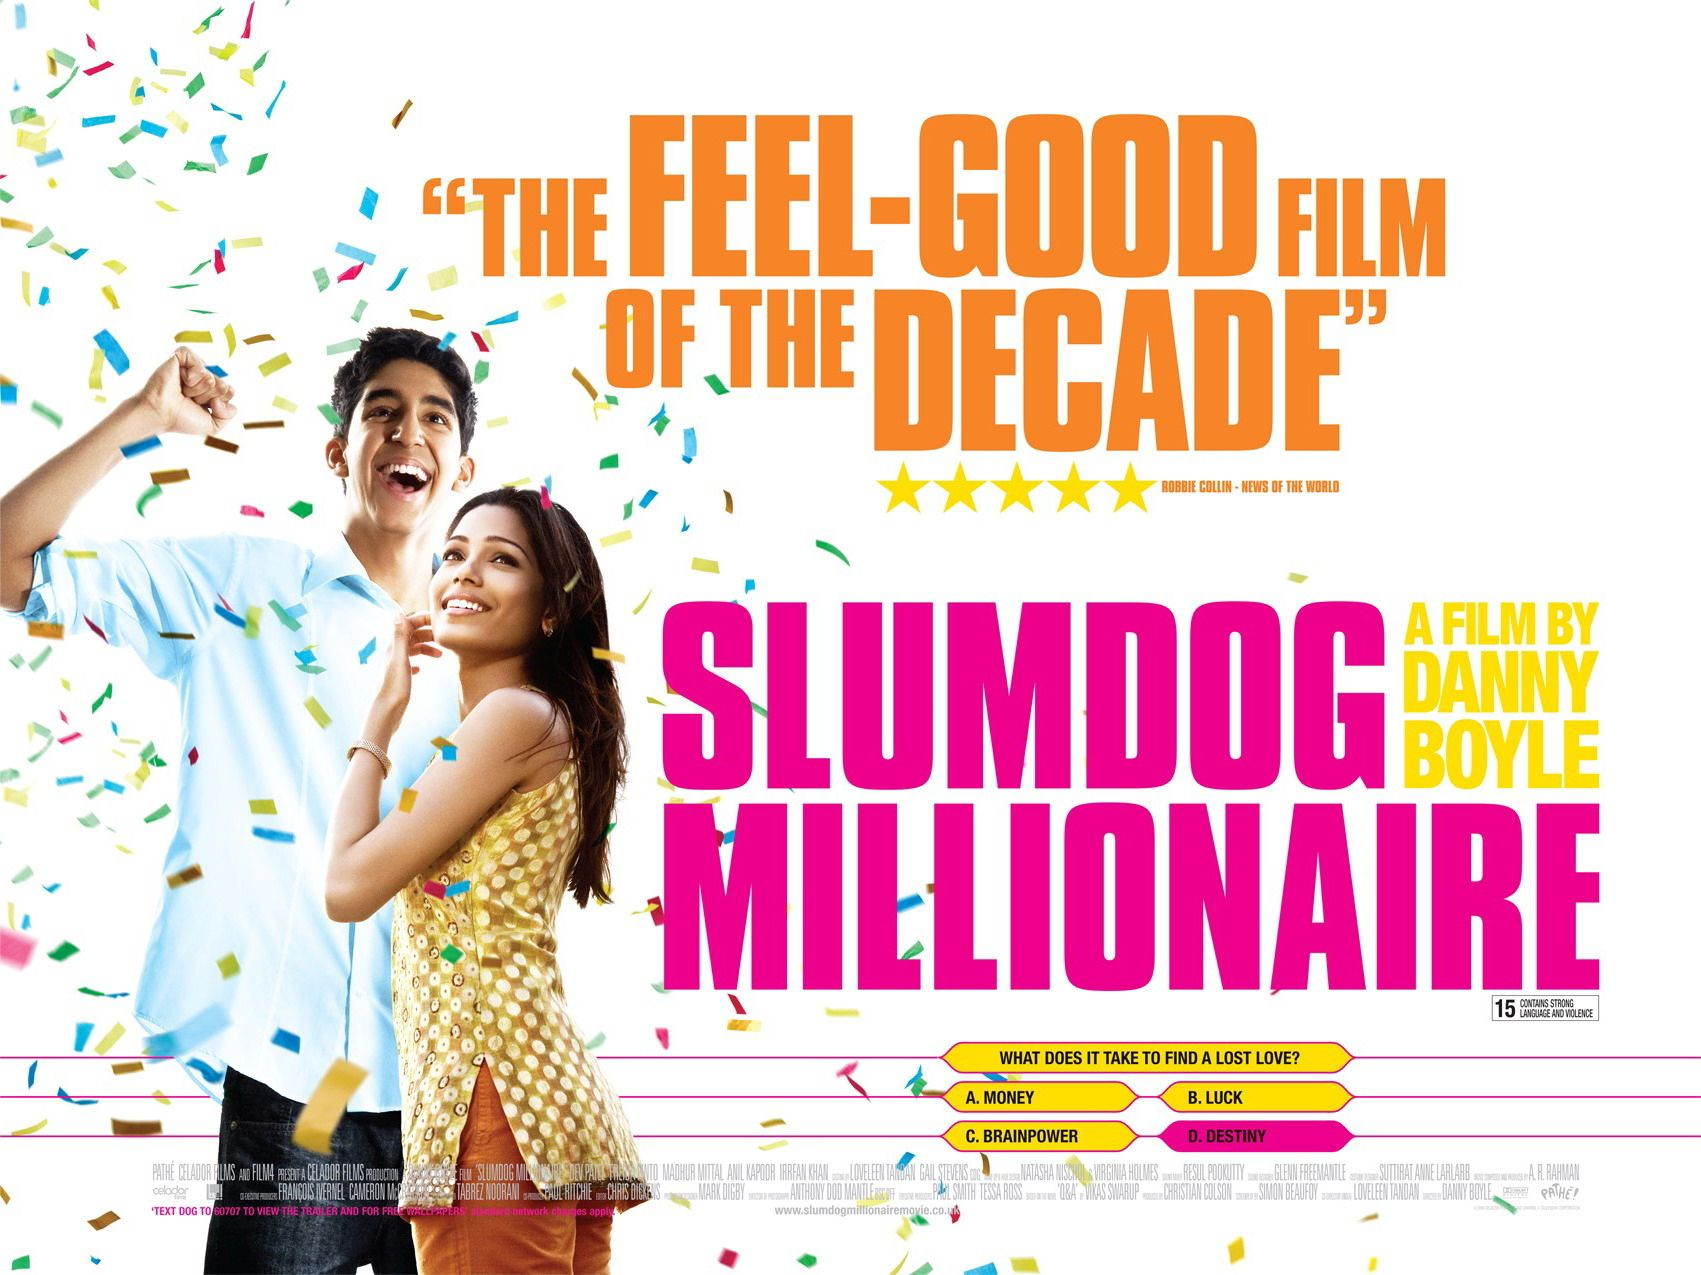 Slumdog Millionaire- Danny Boyle